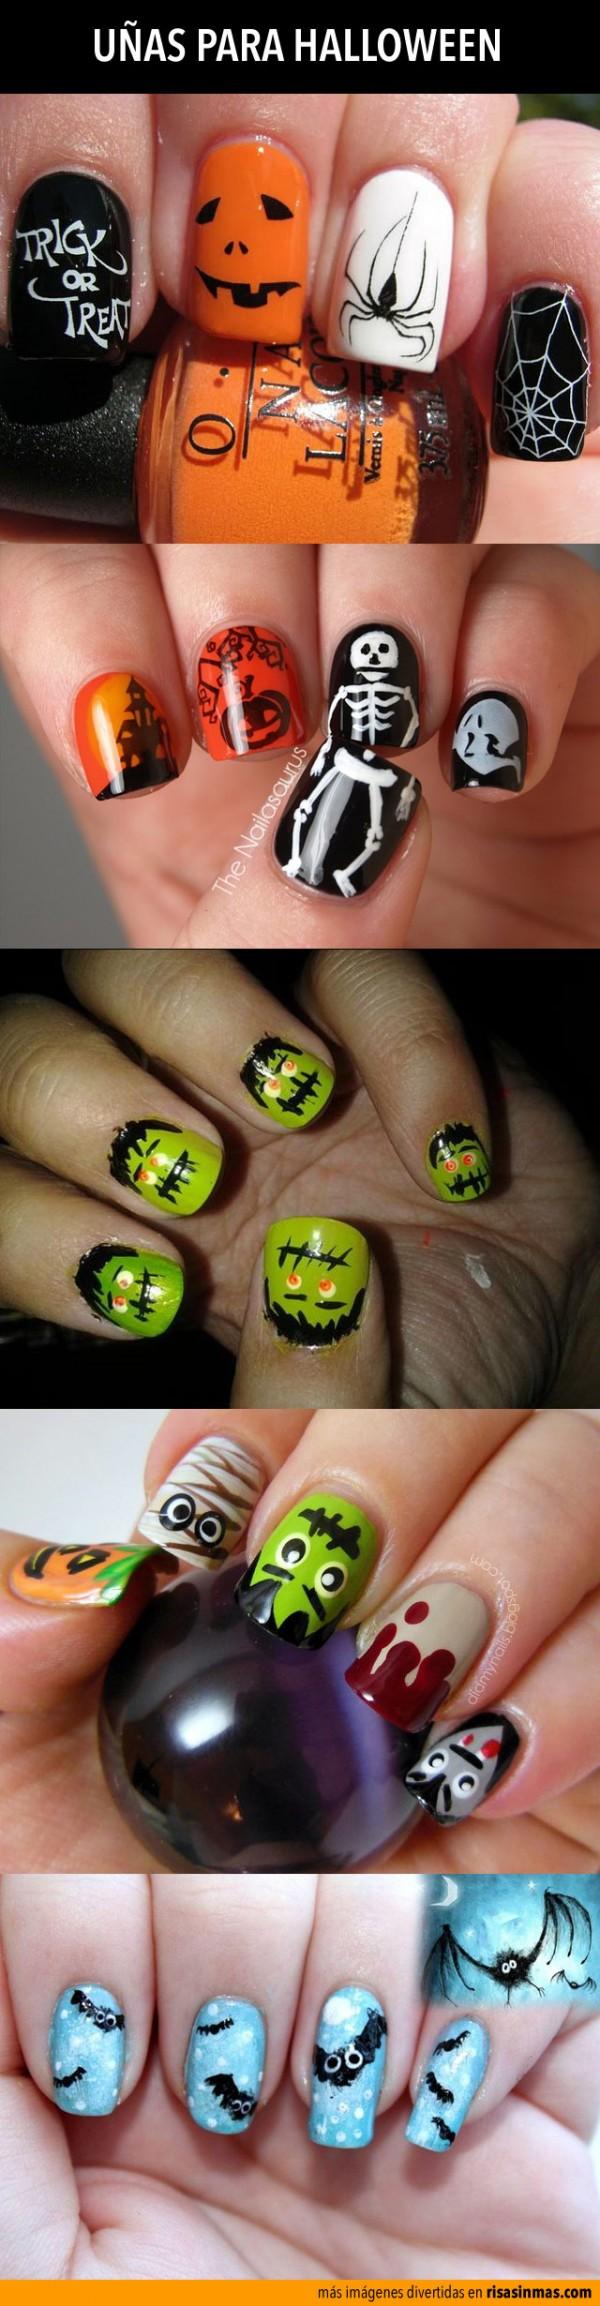 Uñas para Halloween   Diseño de uñas   Pinterest   Nageldesign